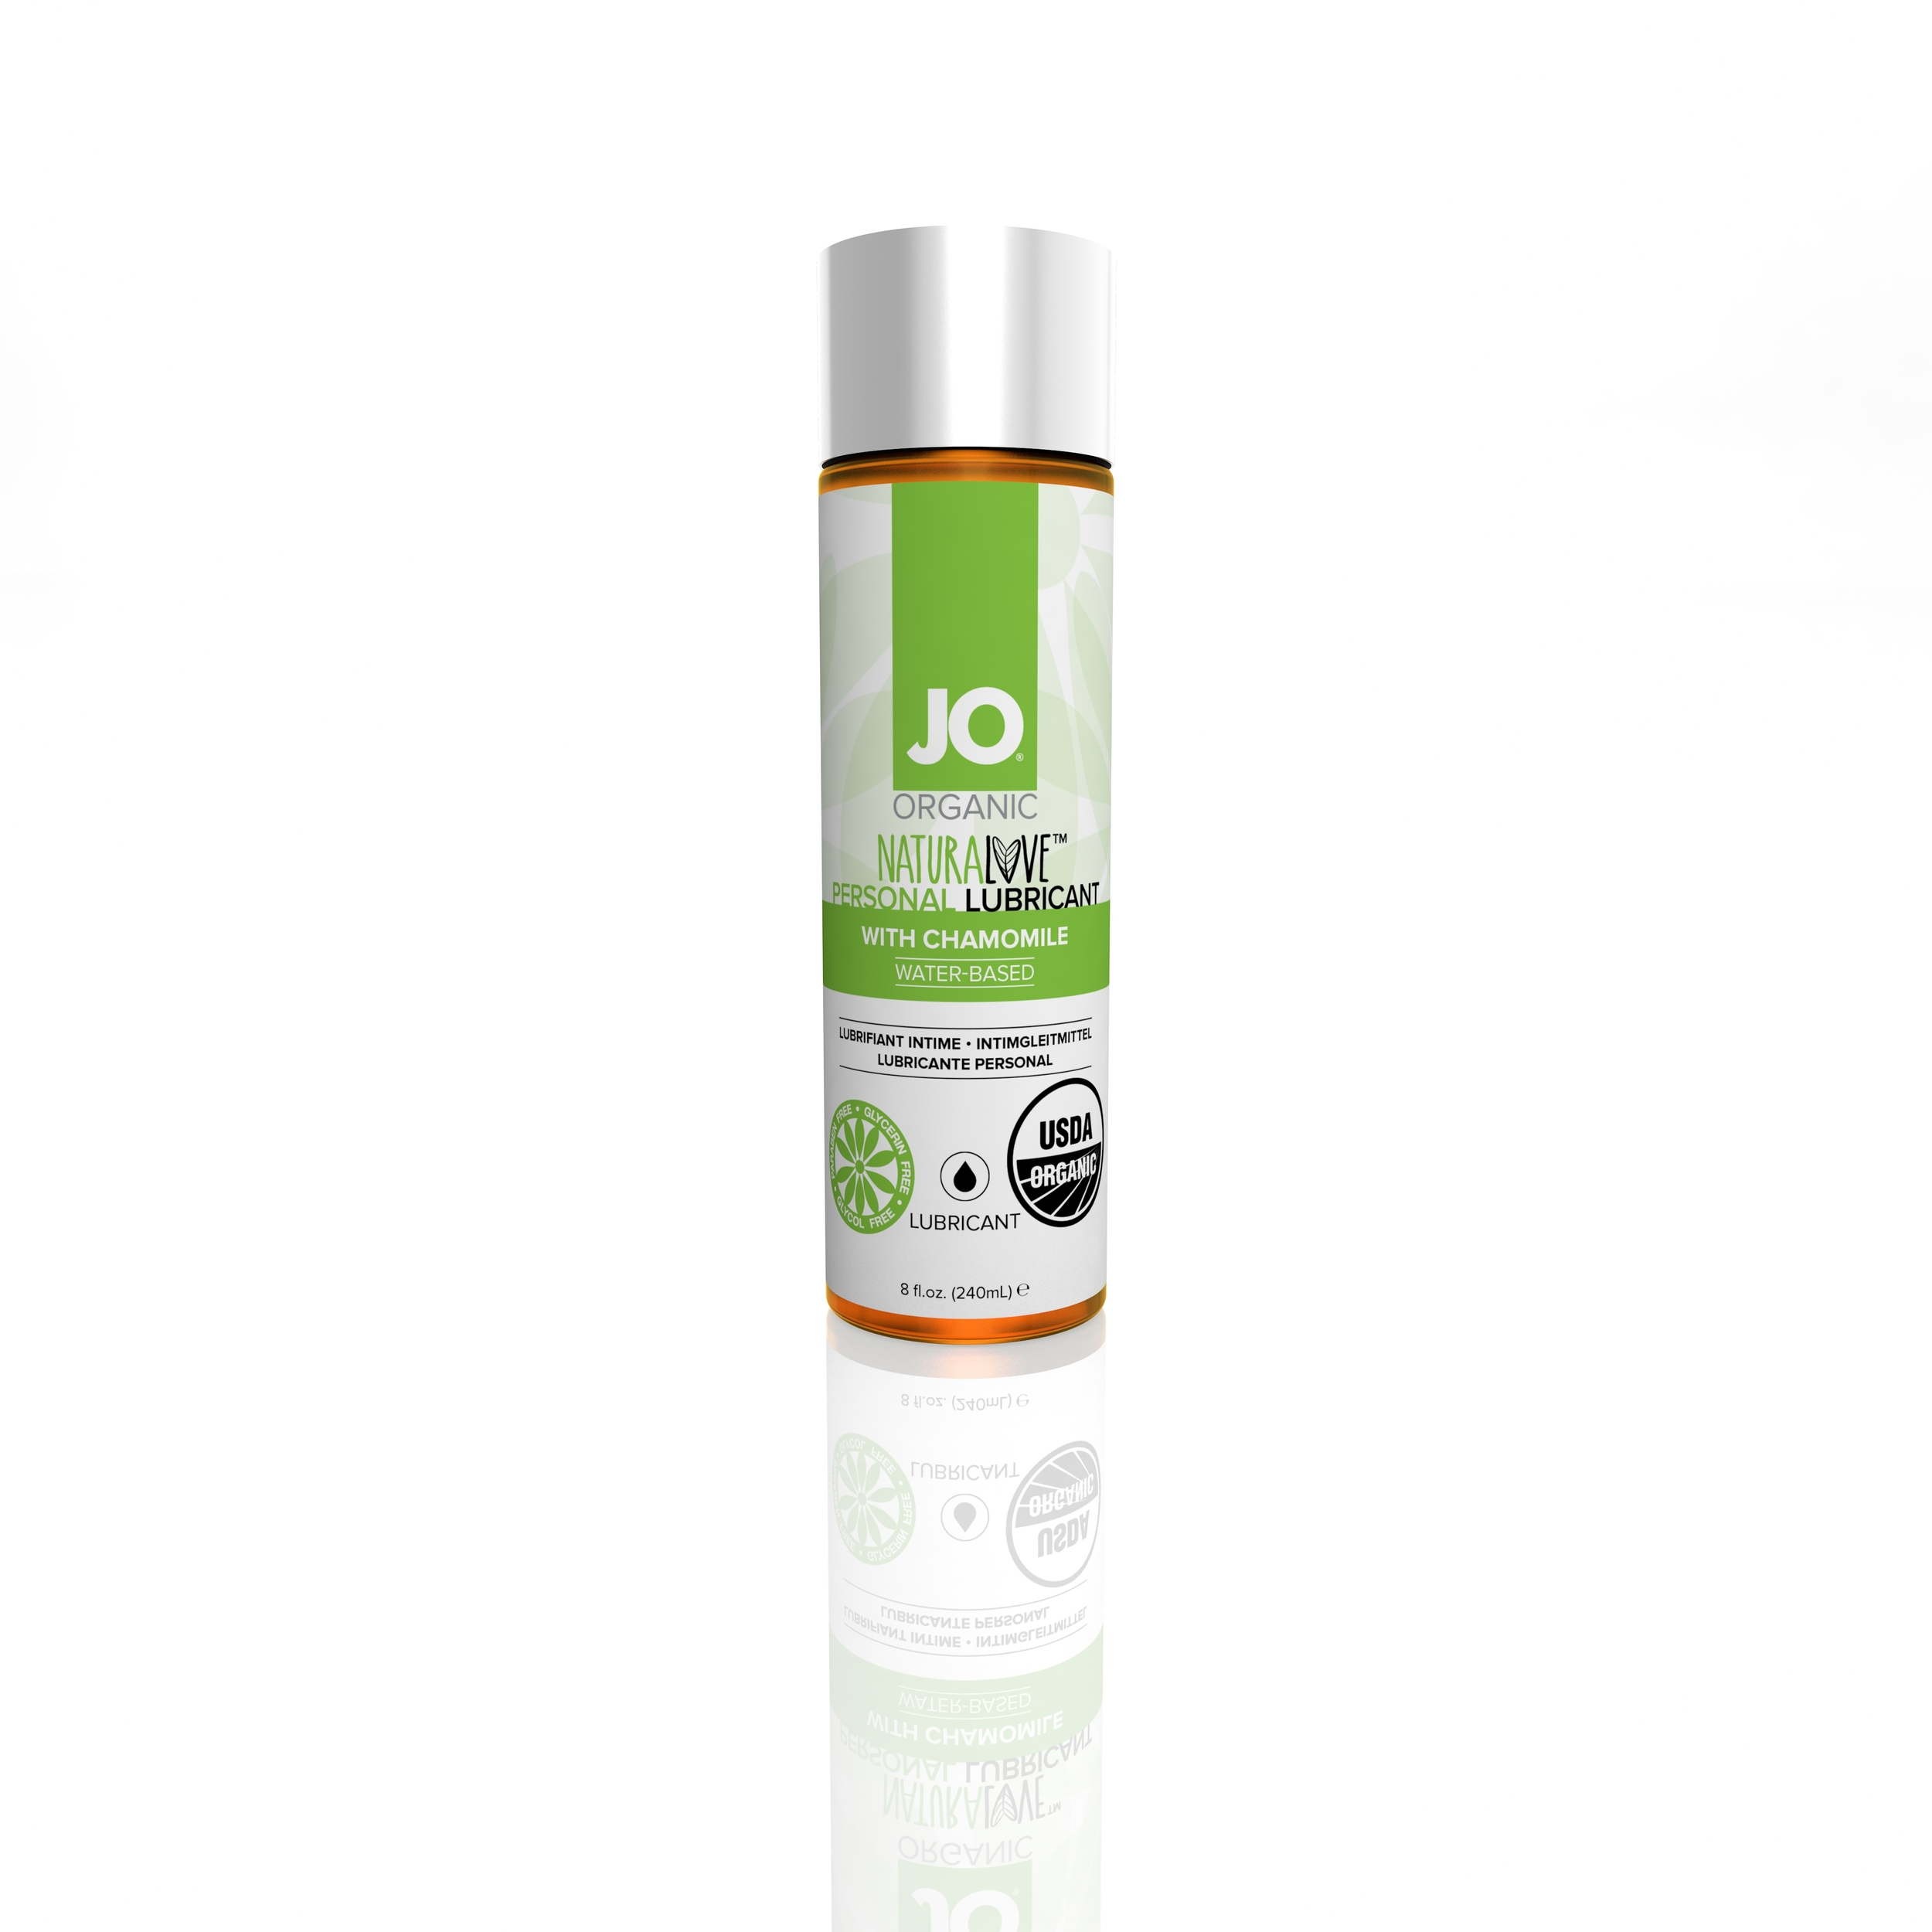 JO USDA Organic 8oz Original Lubricant (straight on) (white)001.jpg